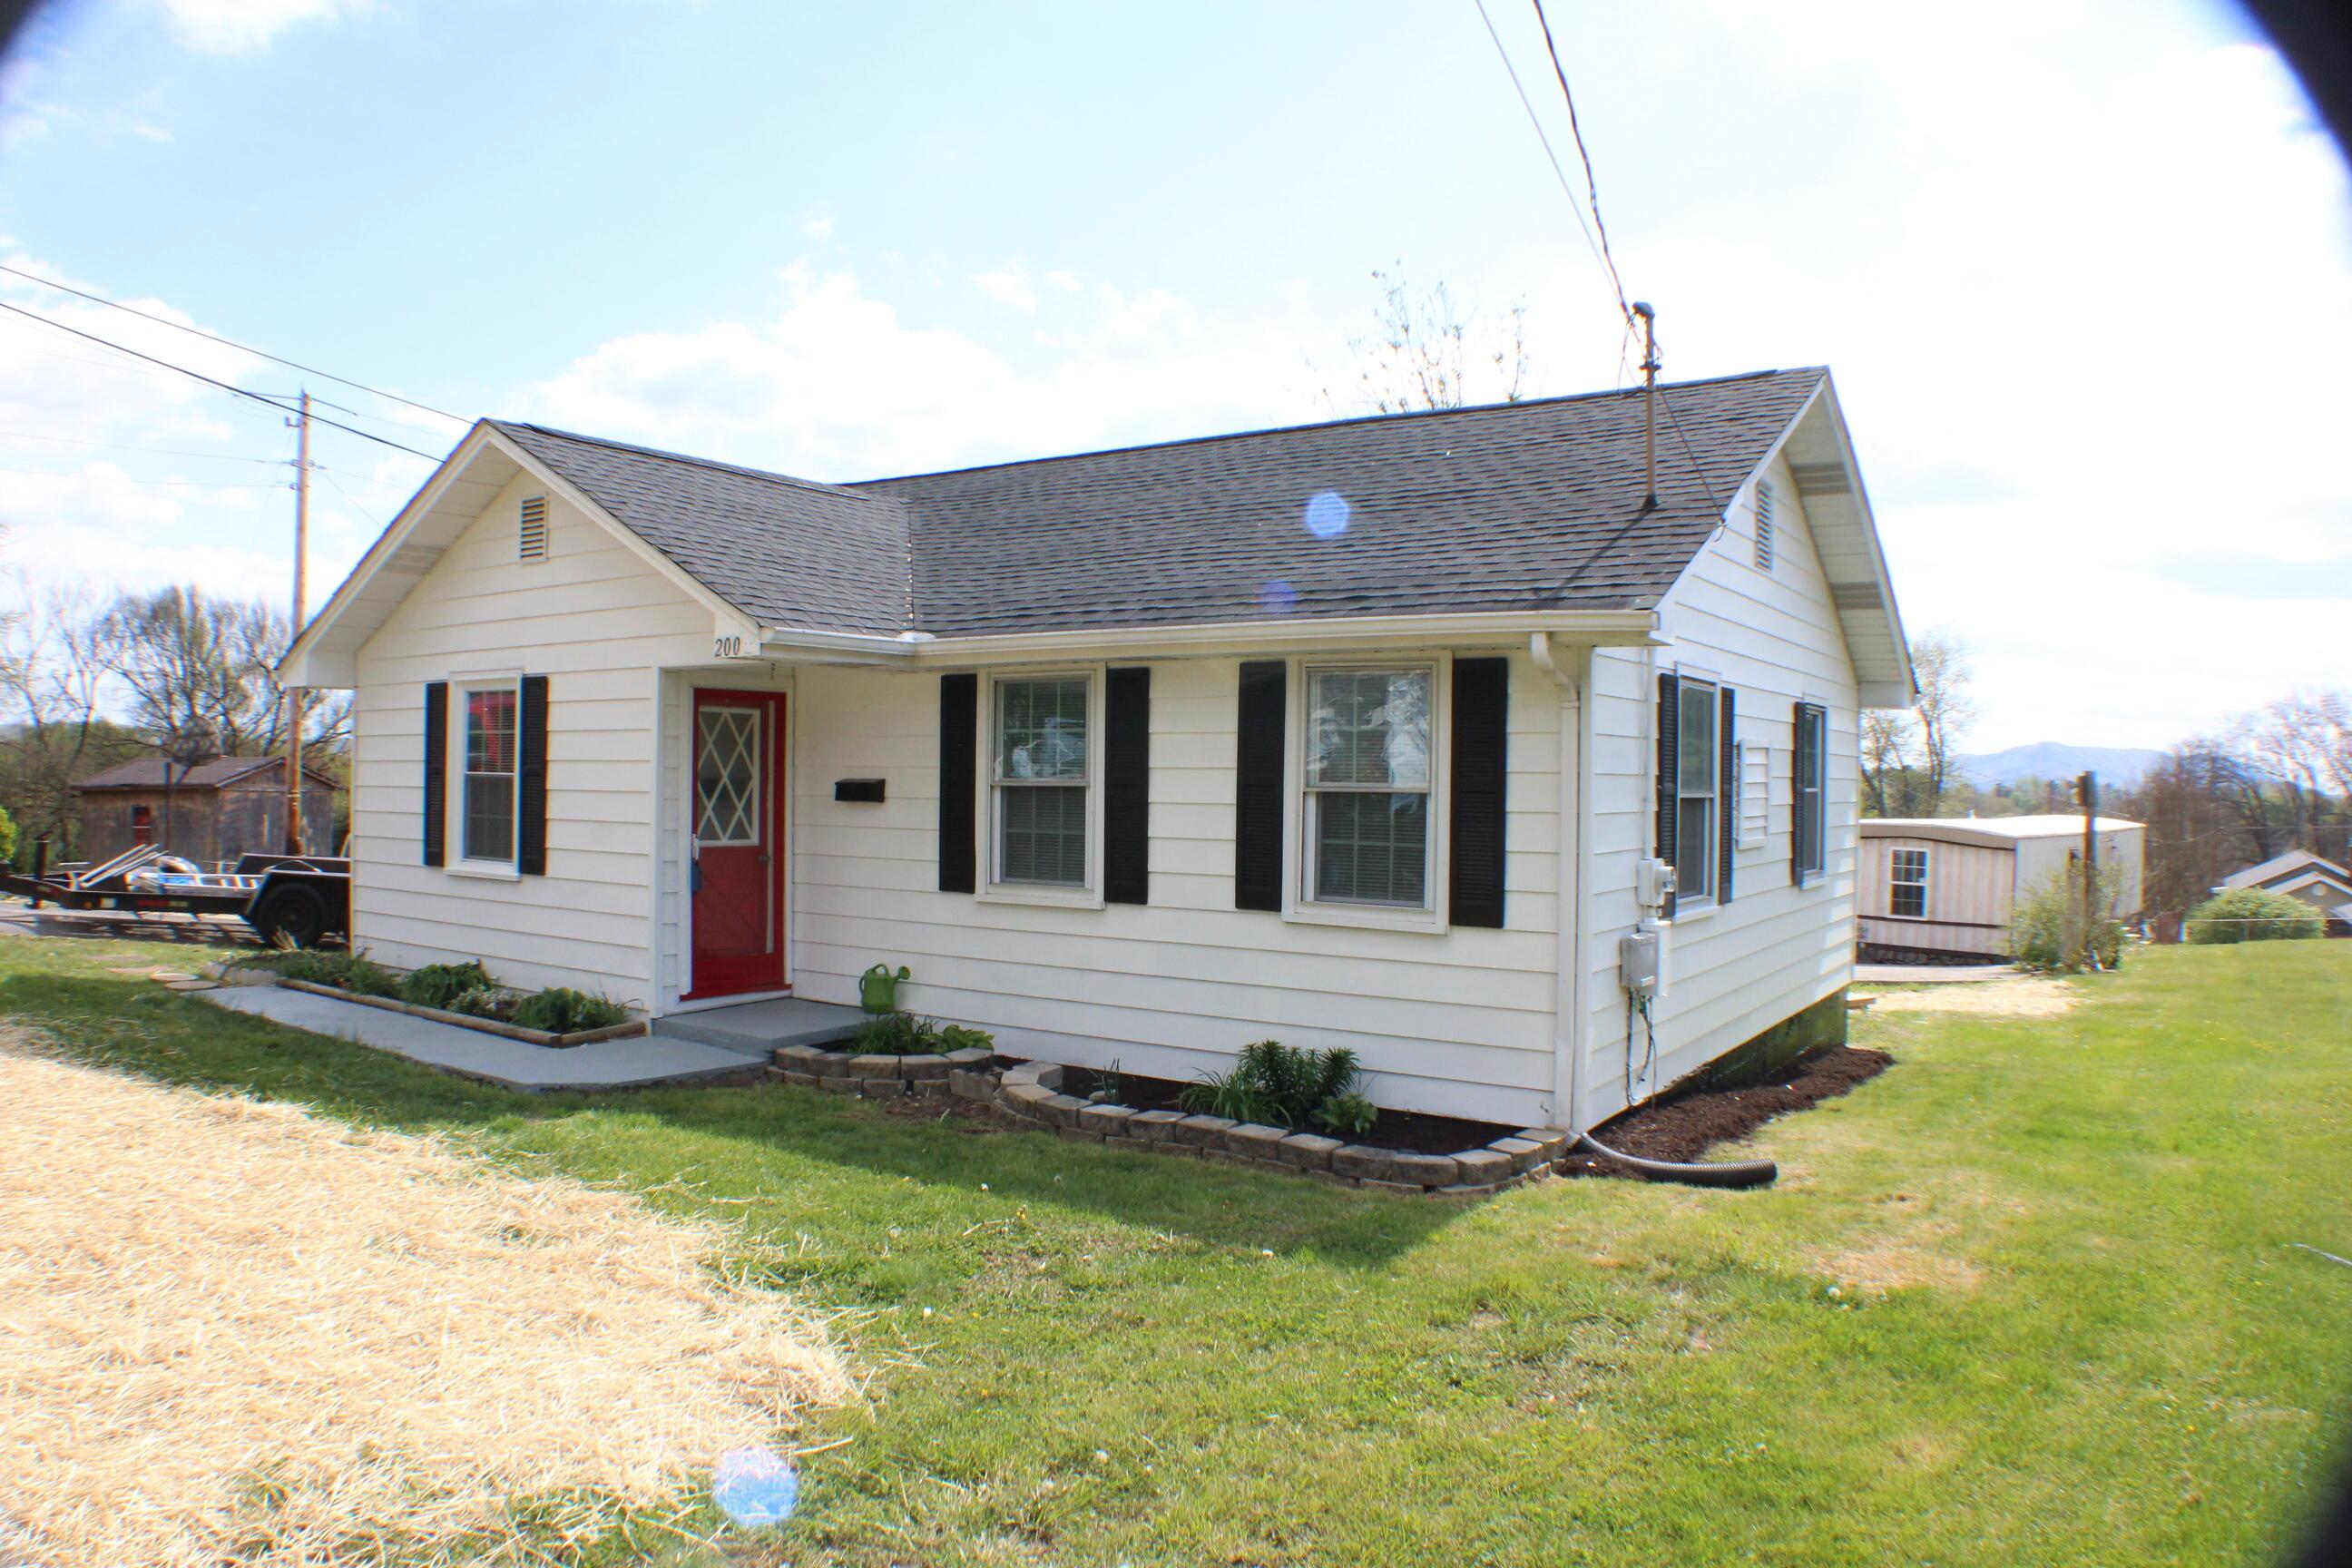 200 Alabama Street, Kingsport, Tennessee 37660, 3 Bedrooms Bedrooms, ,1 BathroomBathrooms,Single Family,For Sale,200 Alabama Street,1,9921355